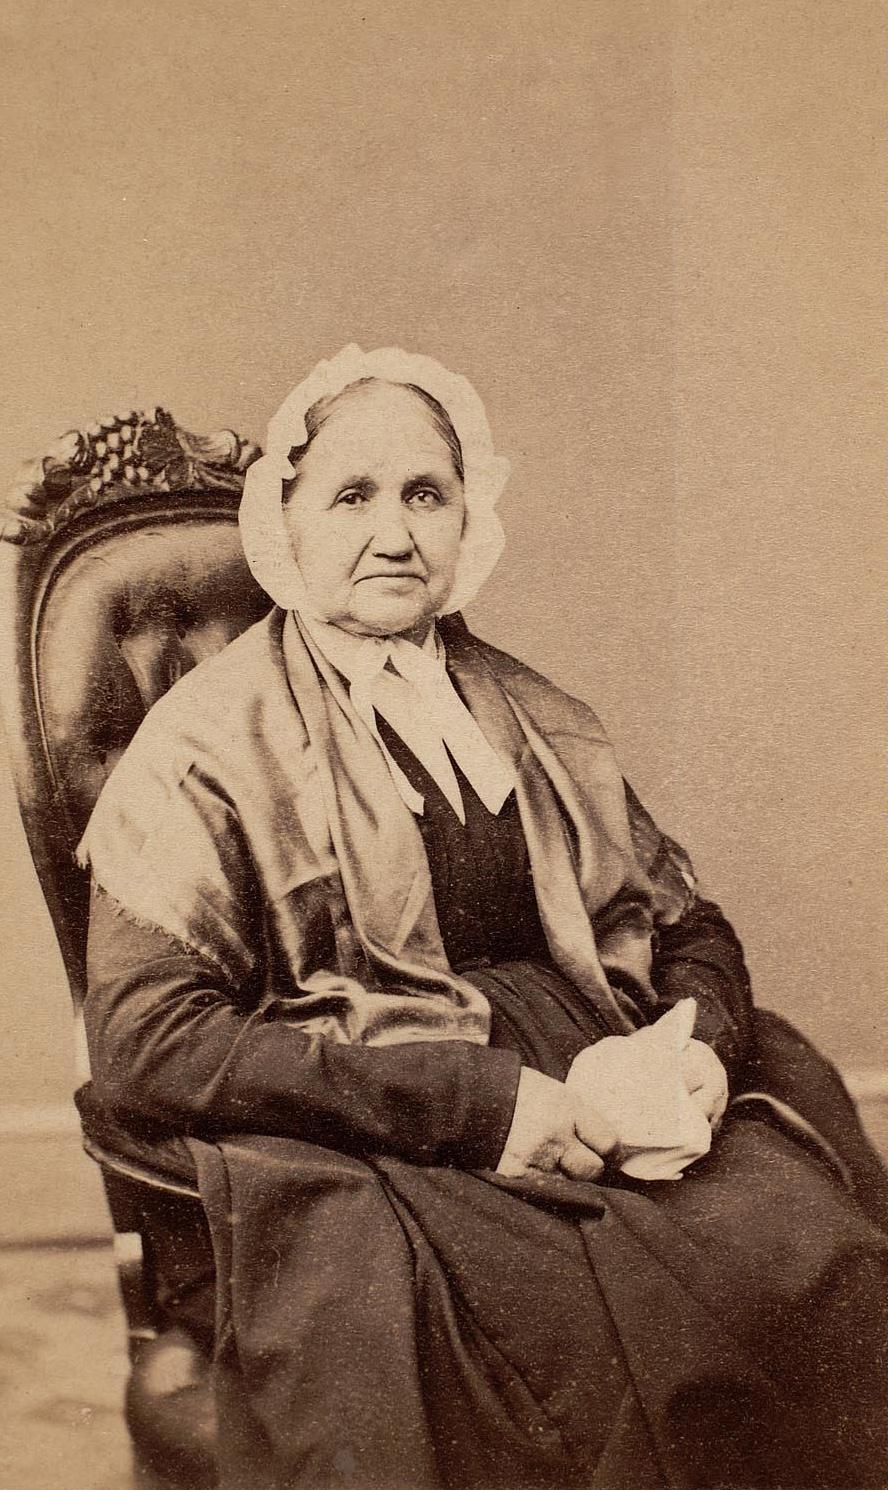 Polly Brundige Mead